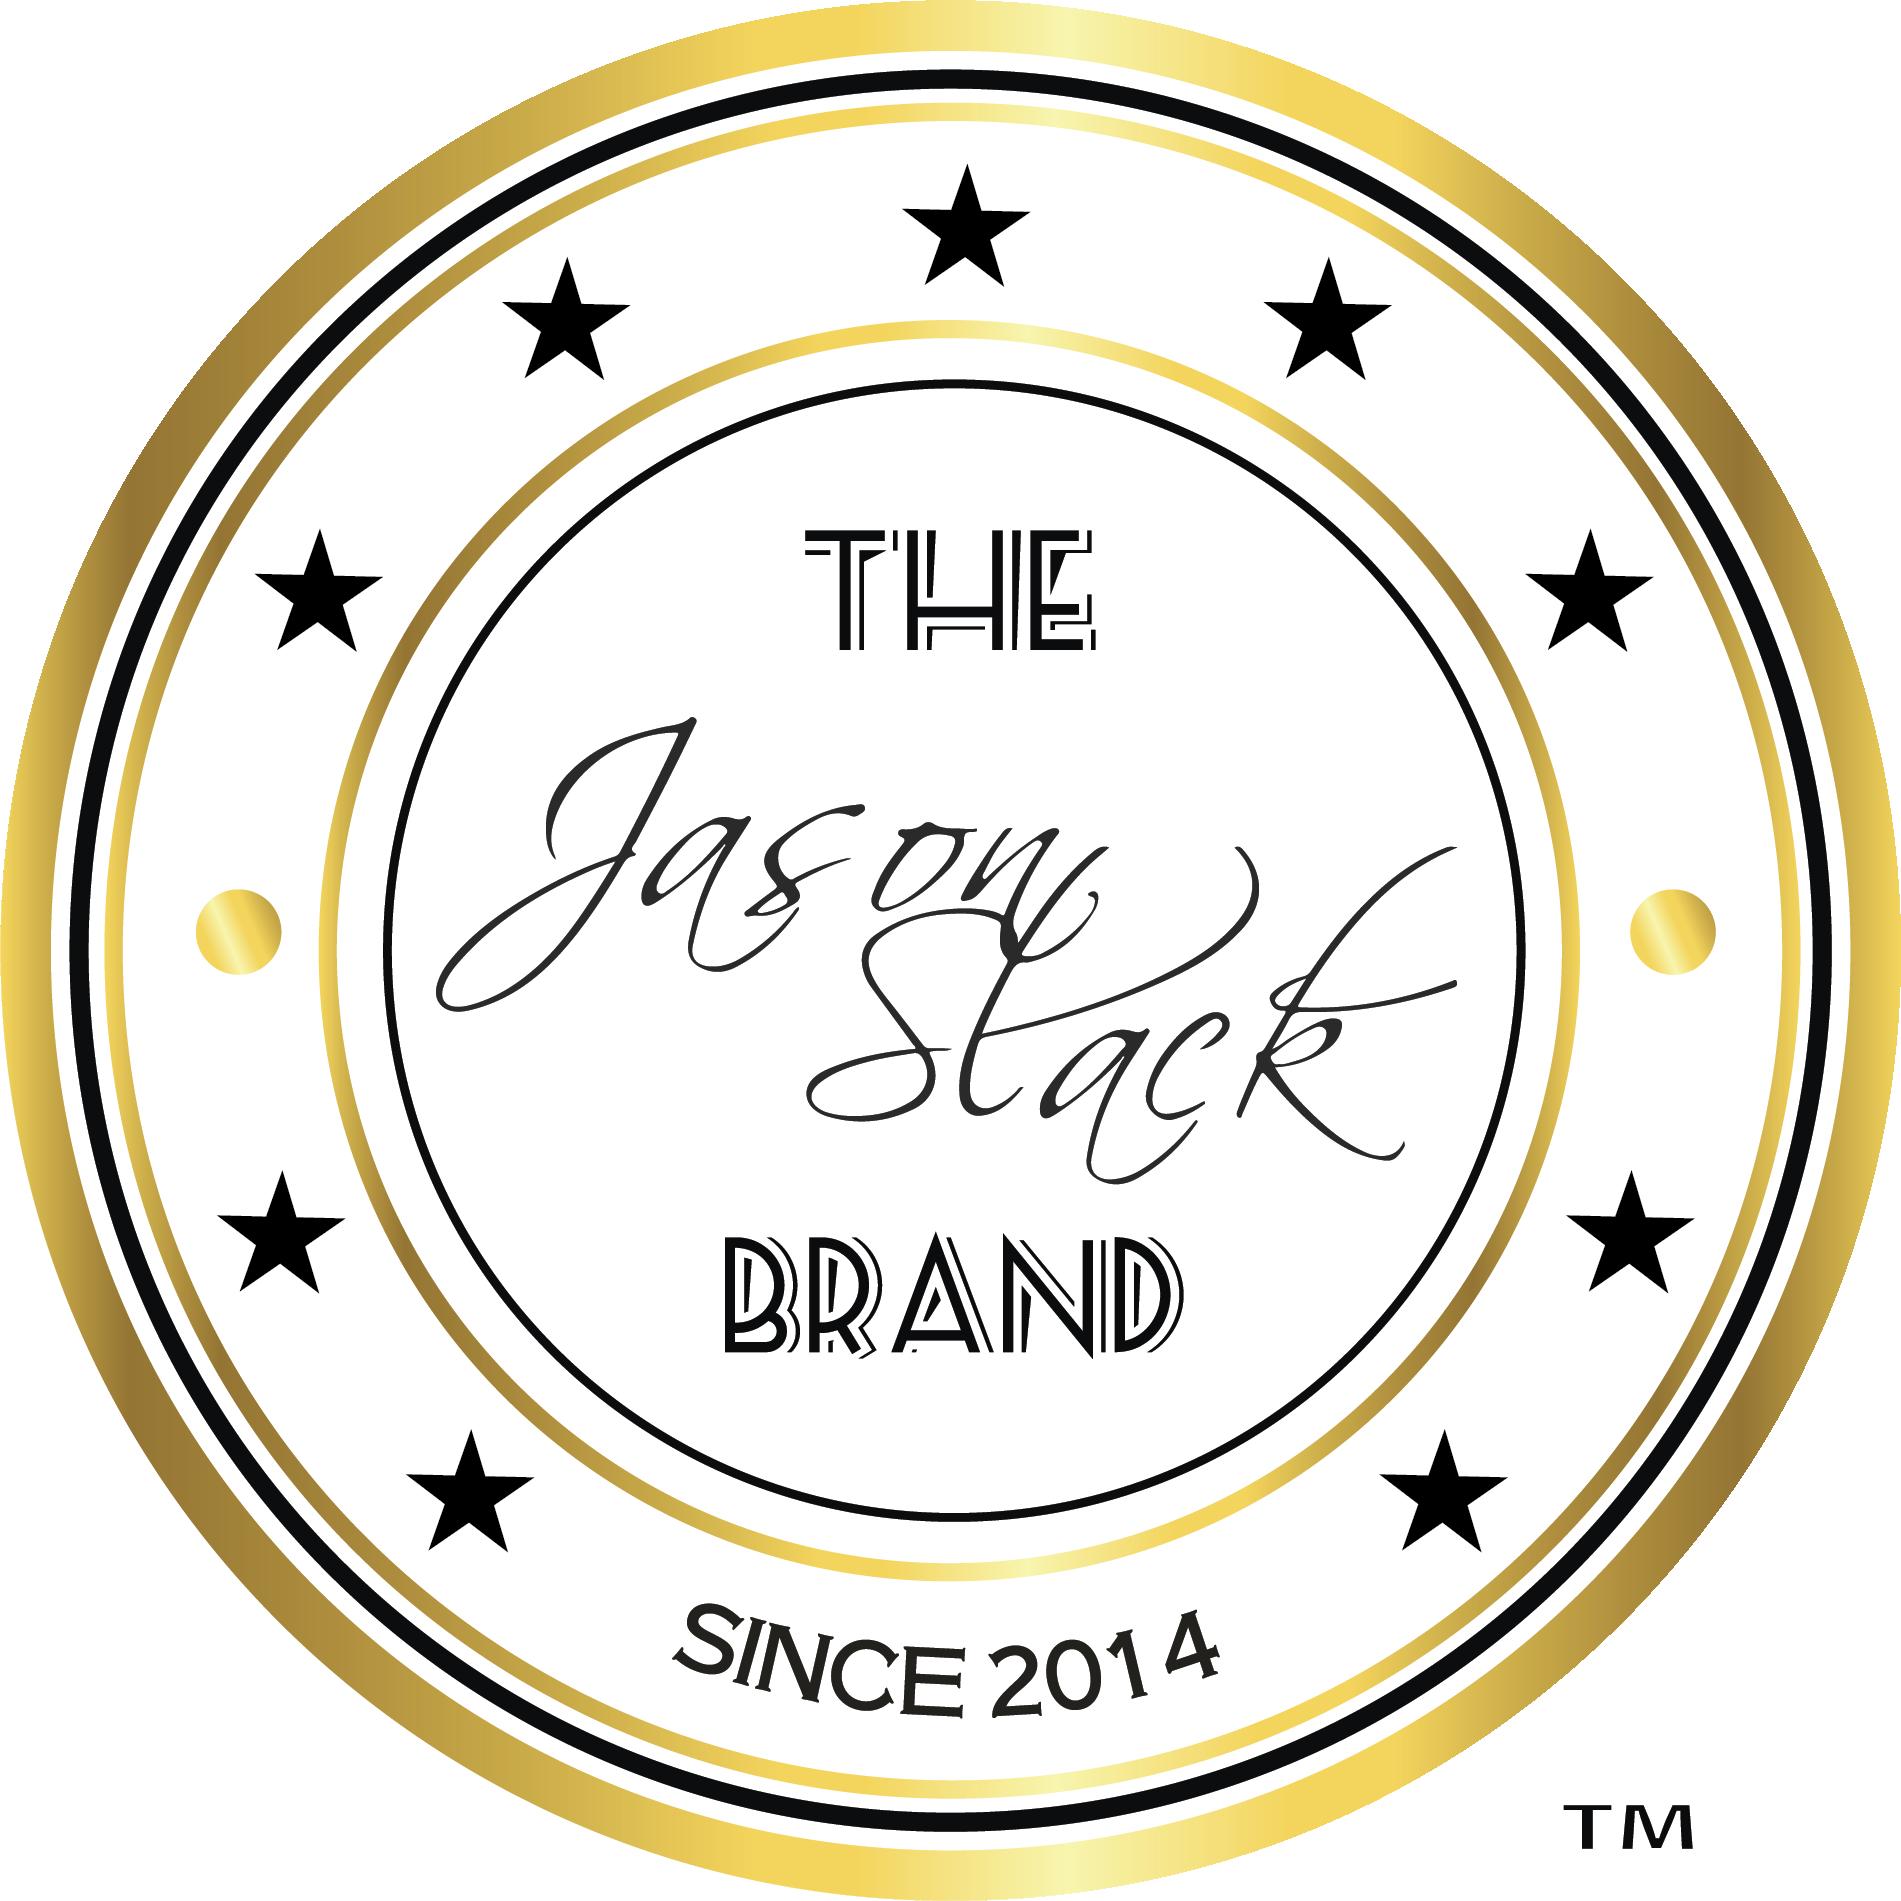 Jason Slack Brand